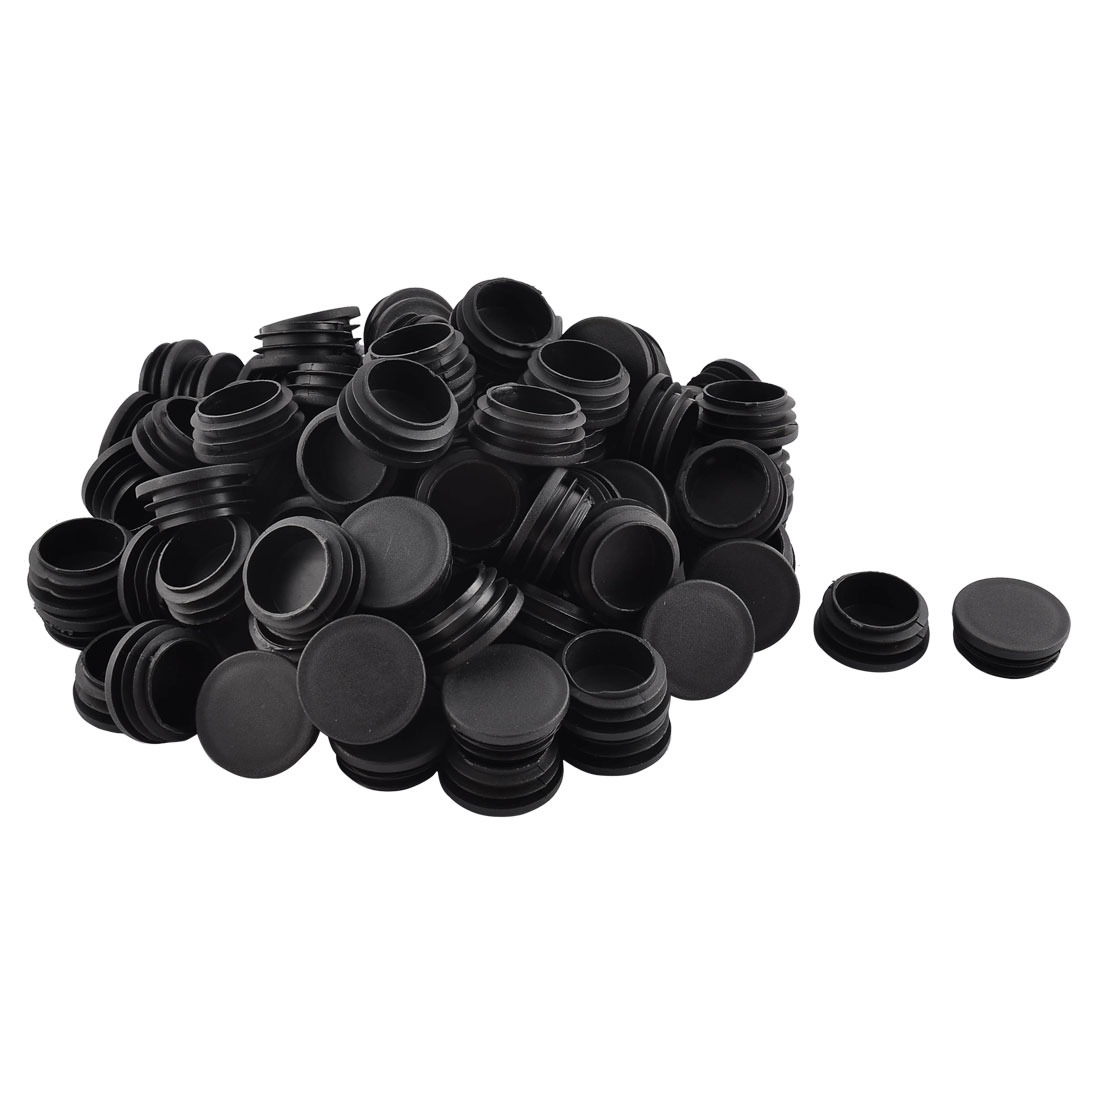 Household Plastic Round Shaped Furniture Table Chair Leg Feet Tube Insert Black 100 Pcs